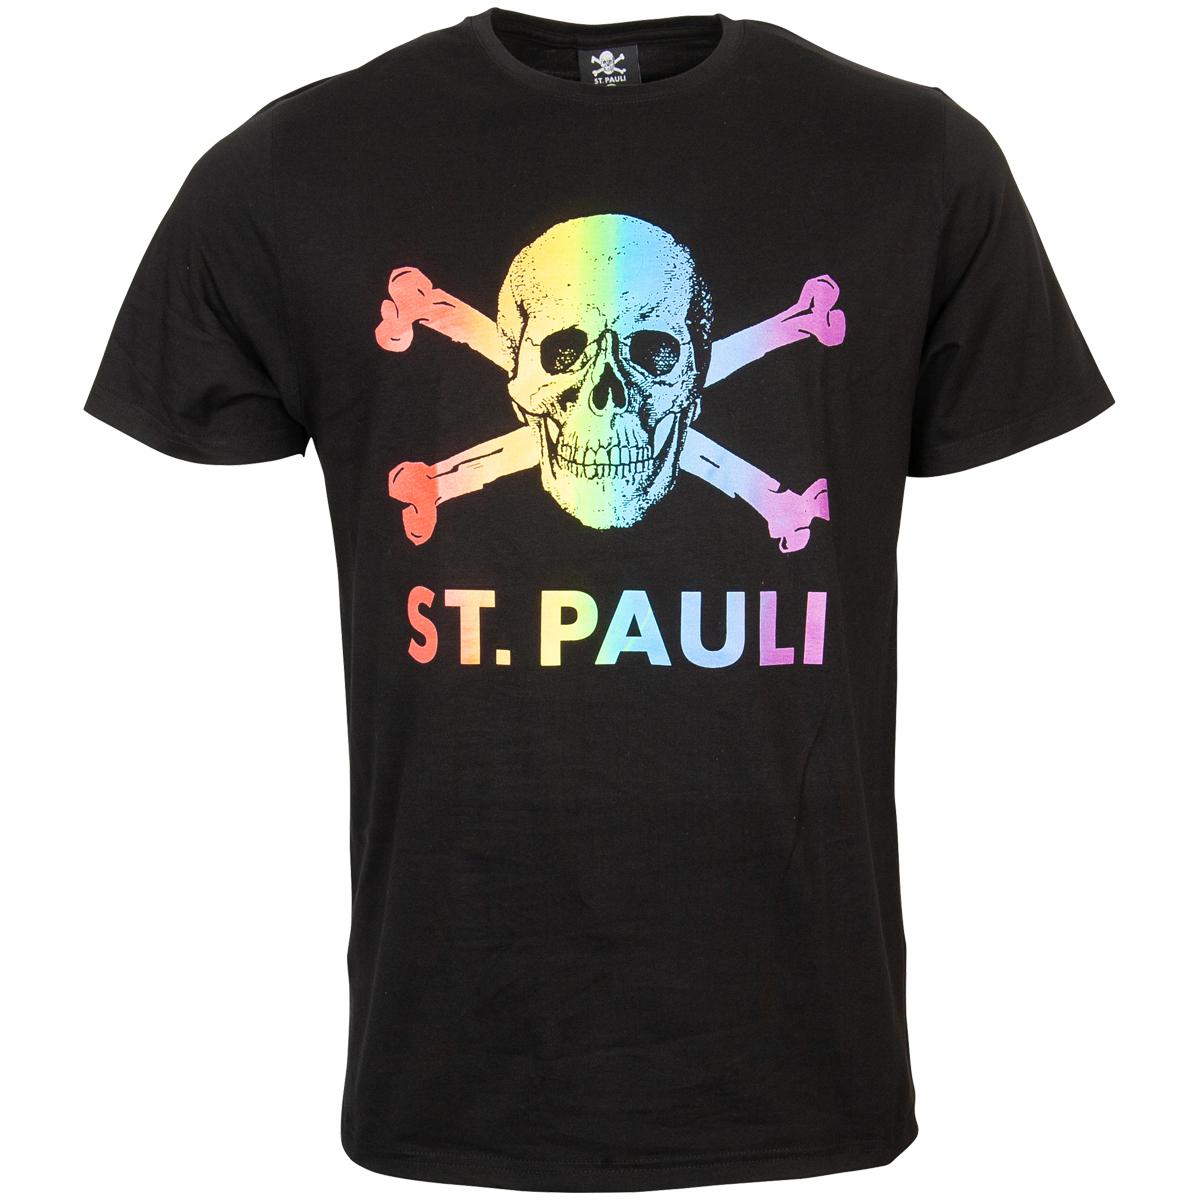 FC St. Pauli - T-Shirt Regenbogen Totenkopf - schwarz